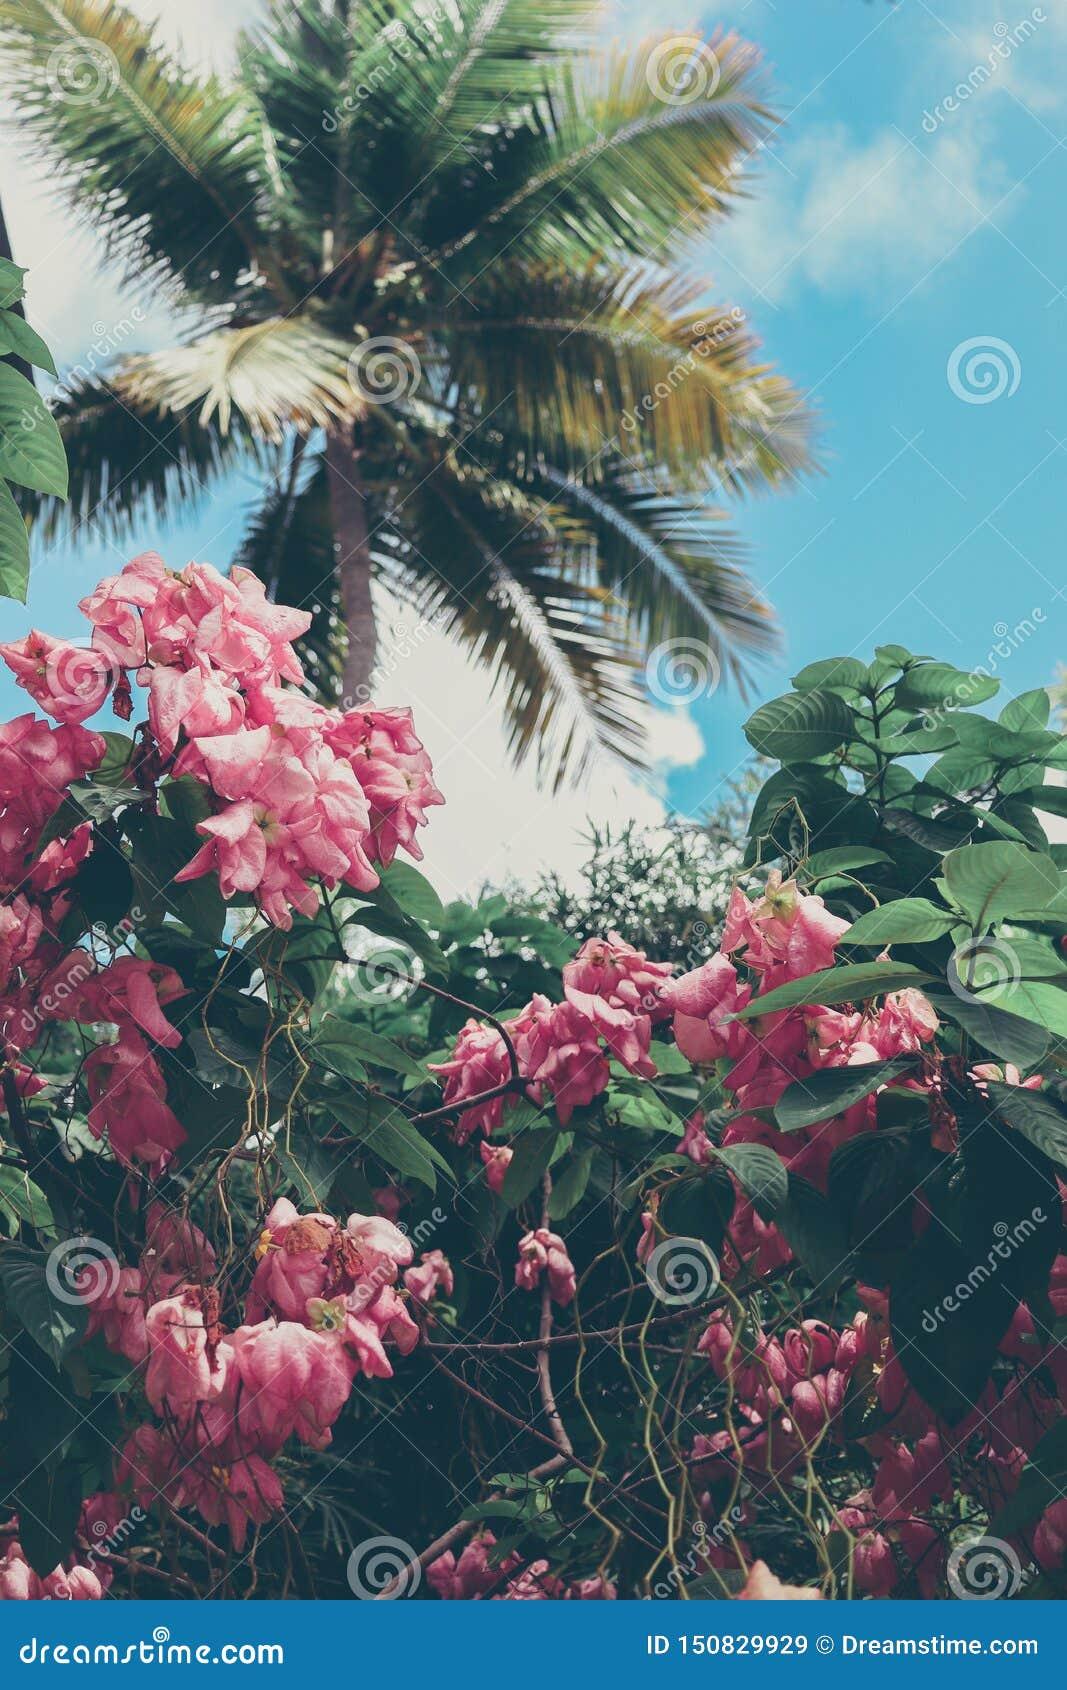 Tropical island flowers, palms, and blue sky